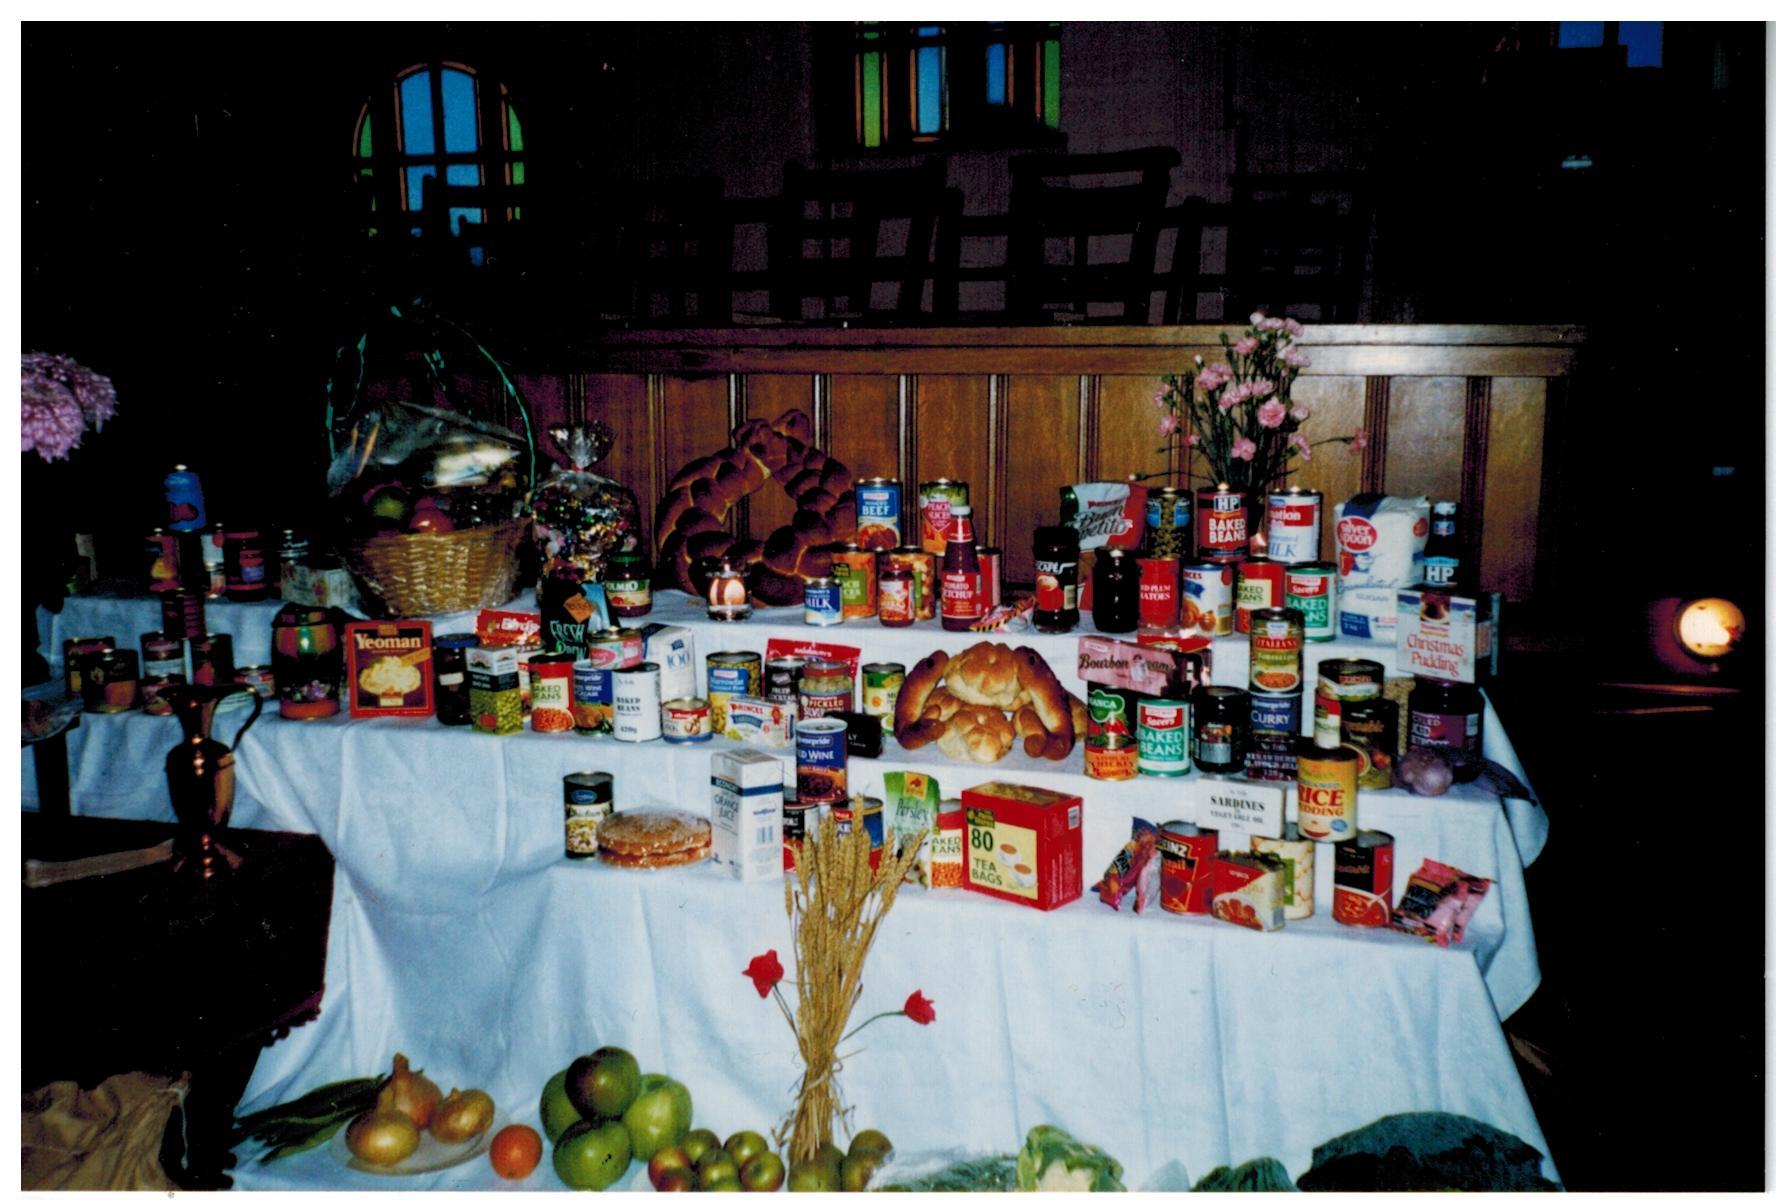 B167 Harvest 1997